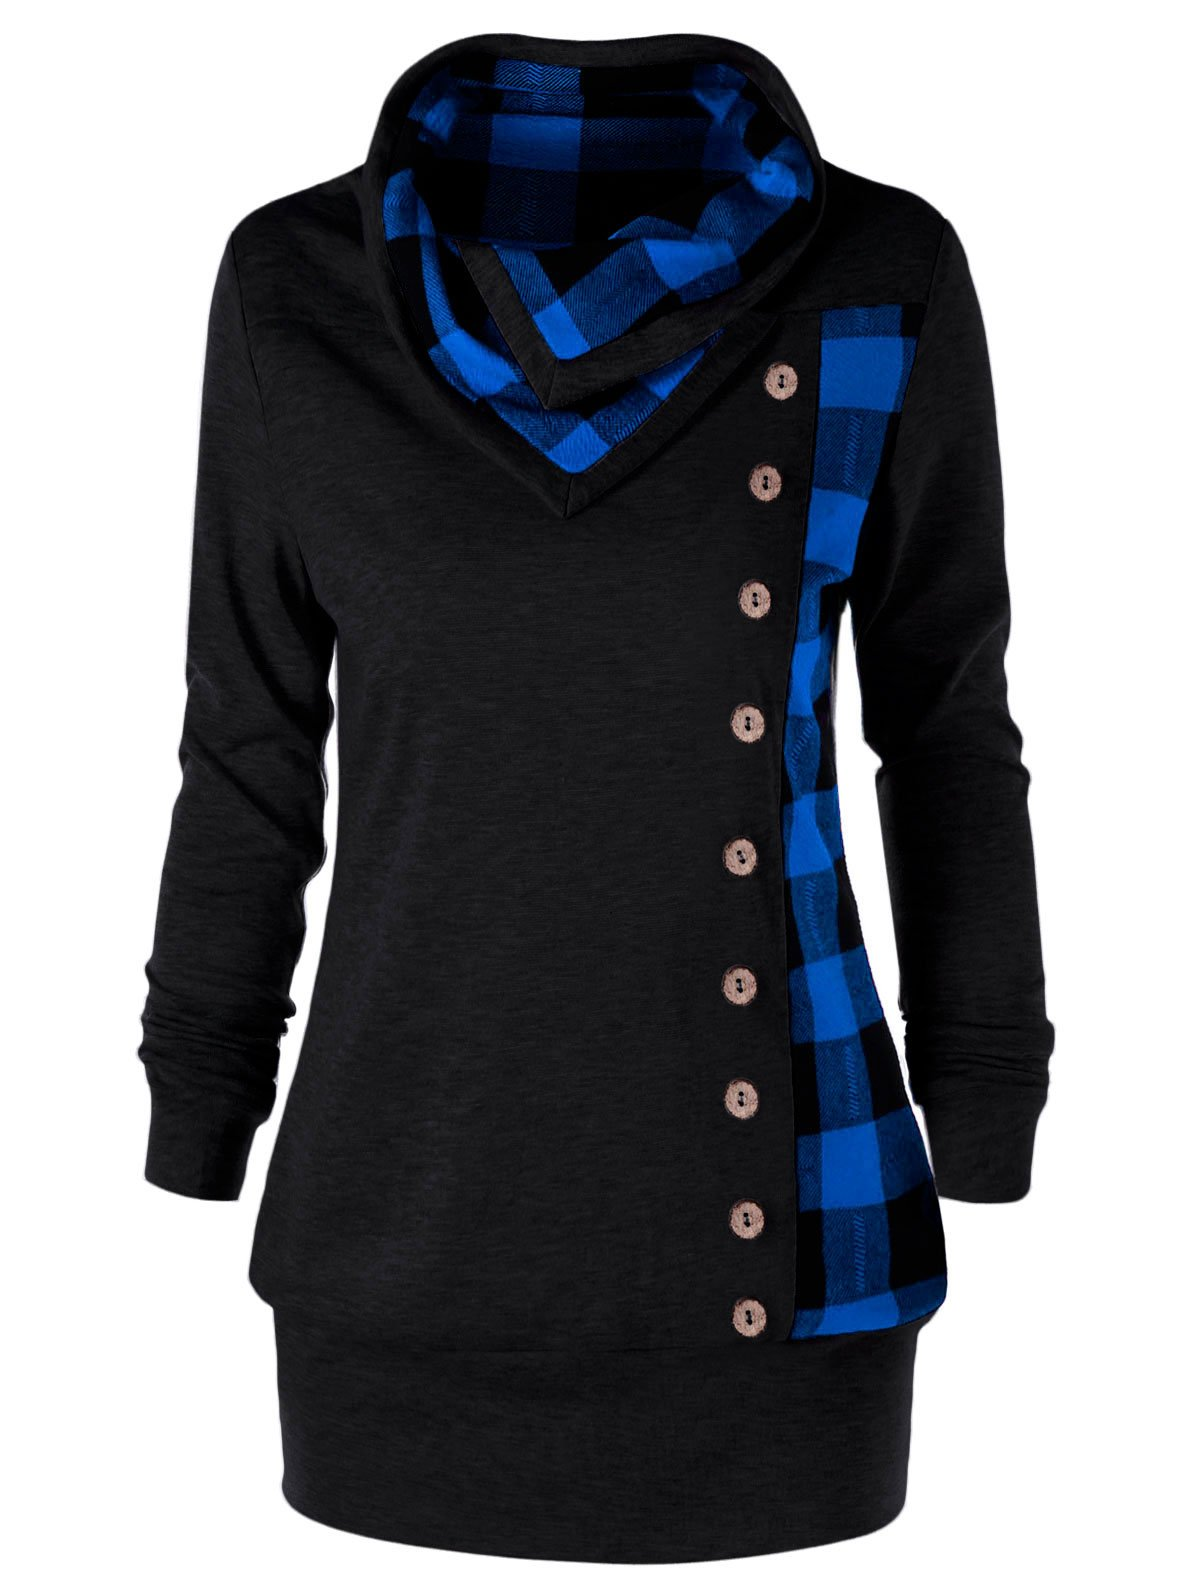 YTJH Women's Plus Size Cowl Neck Single Breasted Long Sleeves Plaid Sweatshirt(Blue,3XL) by YTJH